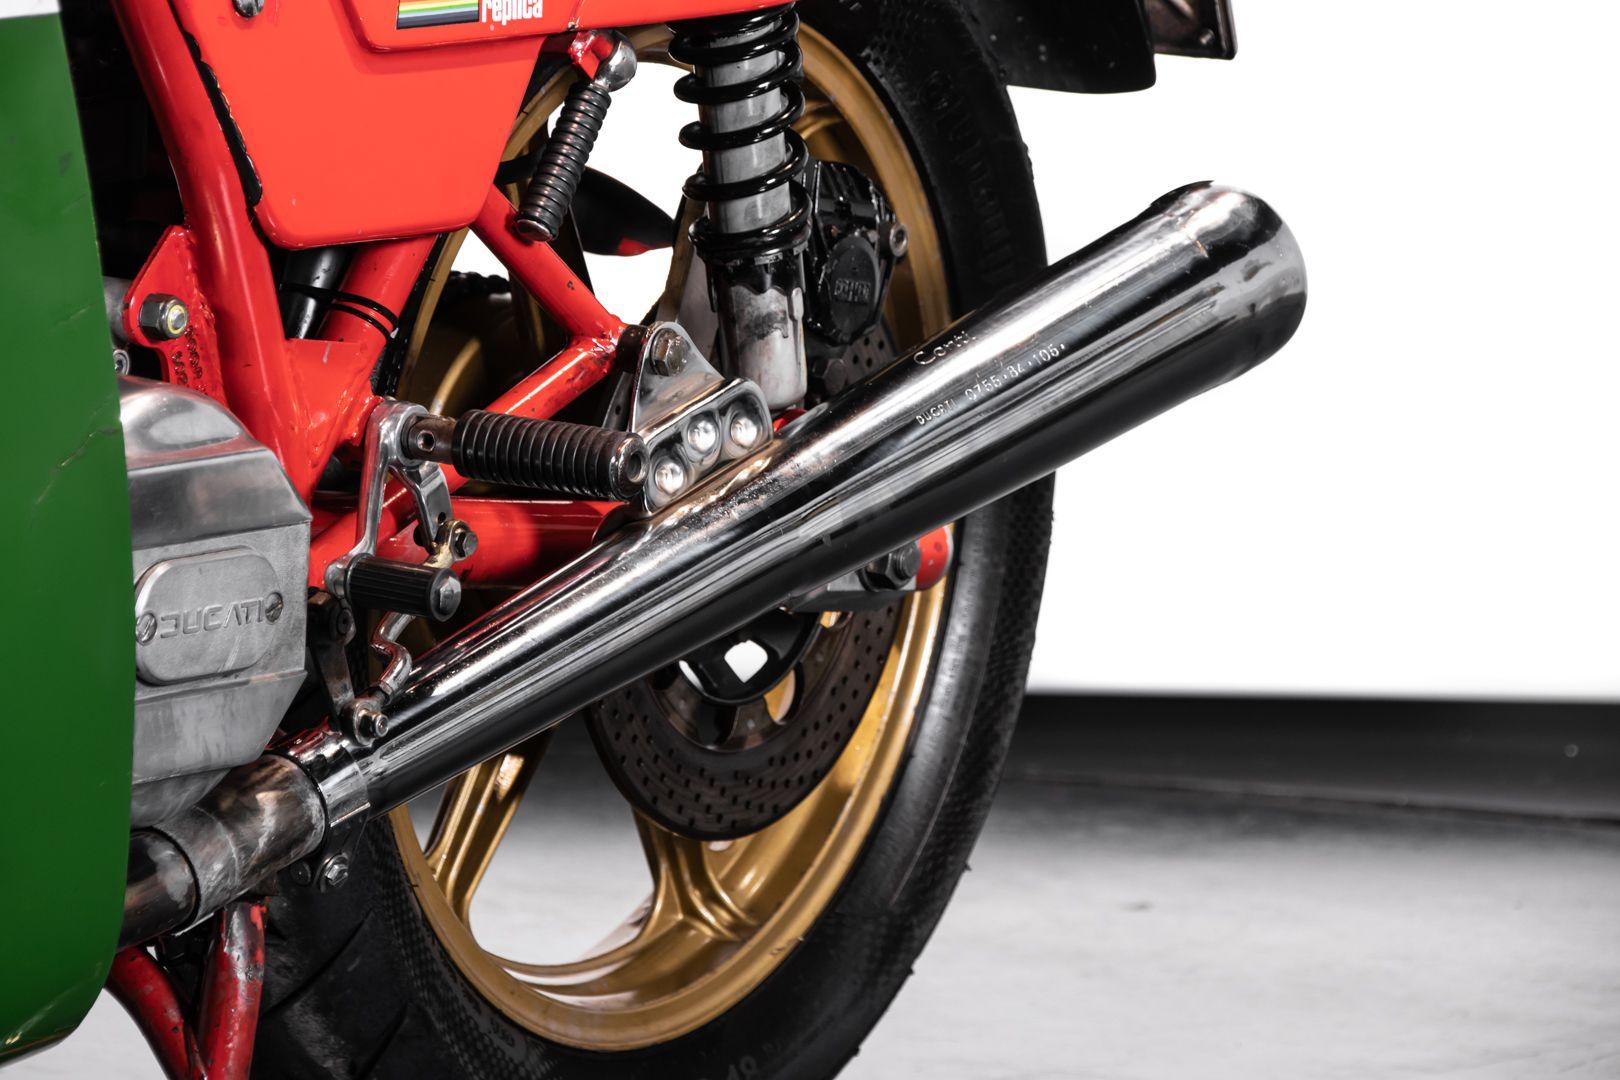 1983 Ducati 900 Mike Hailwood Replica 71414